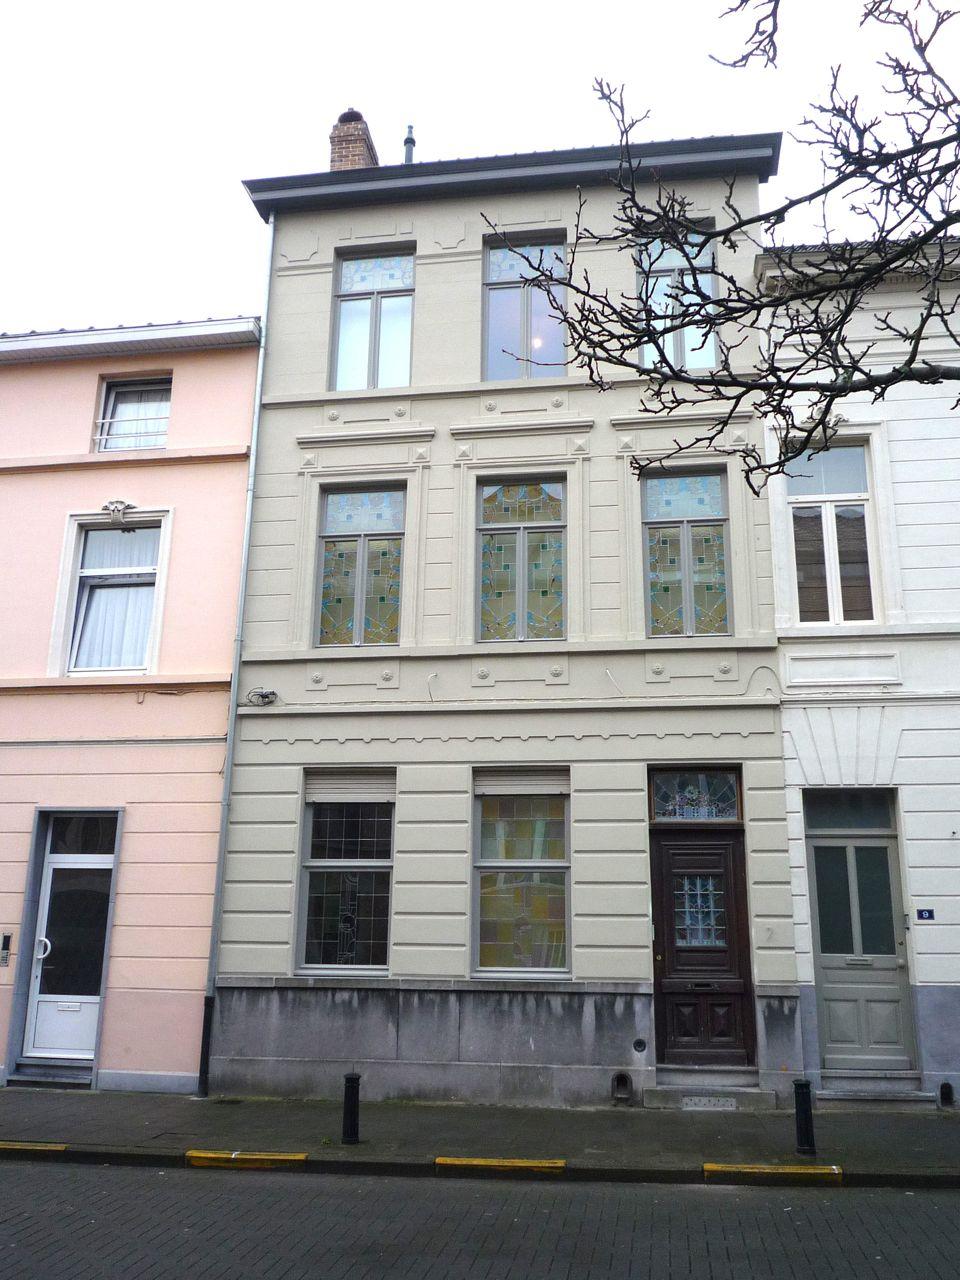 P1050588 | Baeyens & Beck architecten Gent | architect nieuwbouw renovatie interieur | high end | architectenbureau